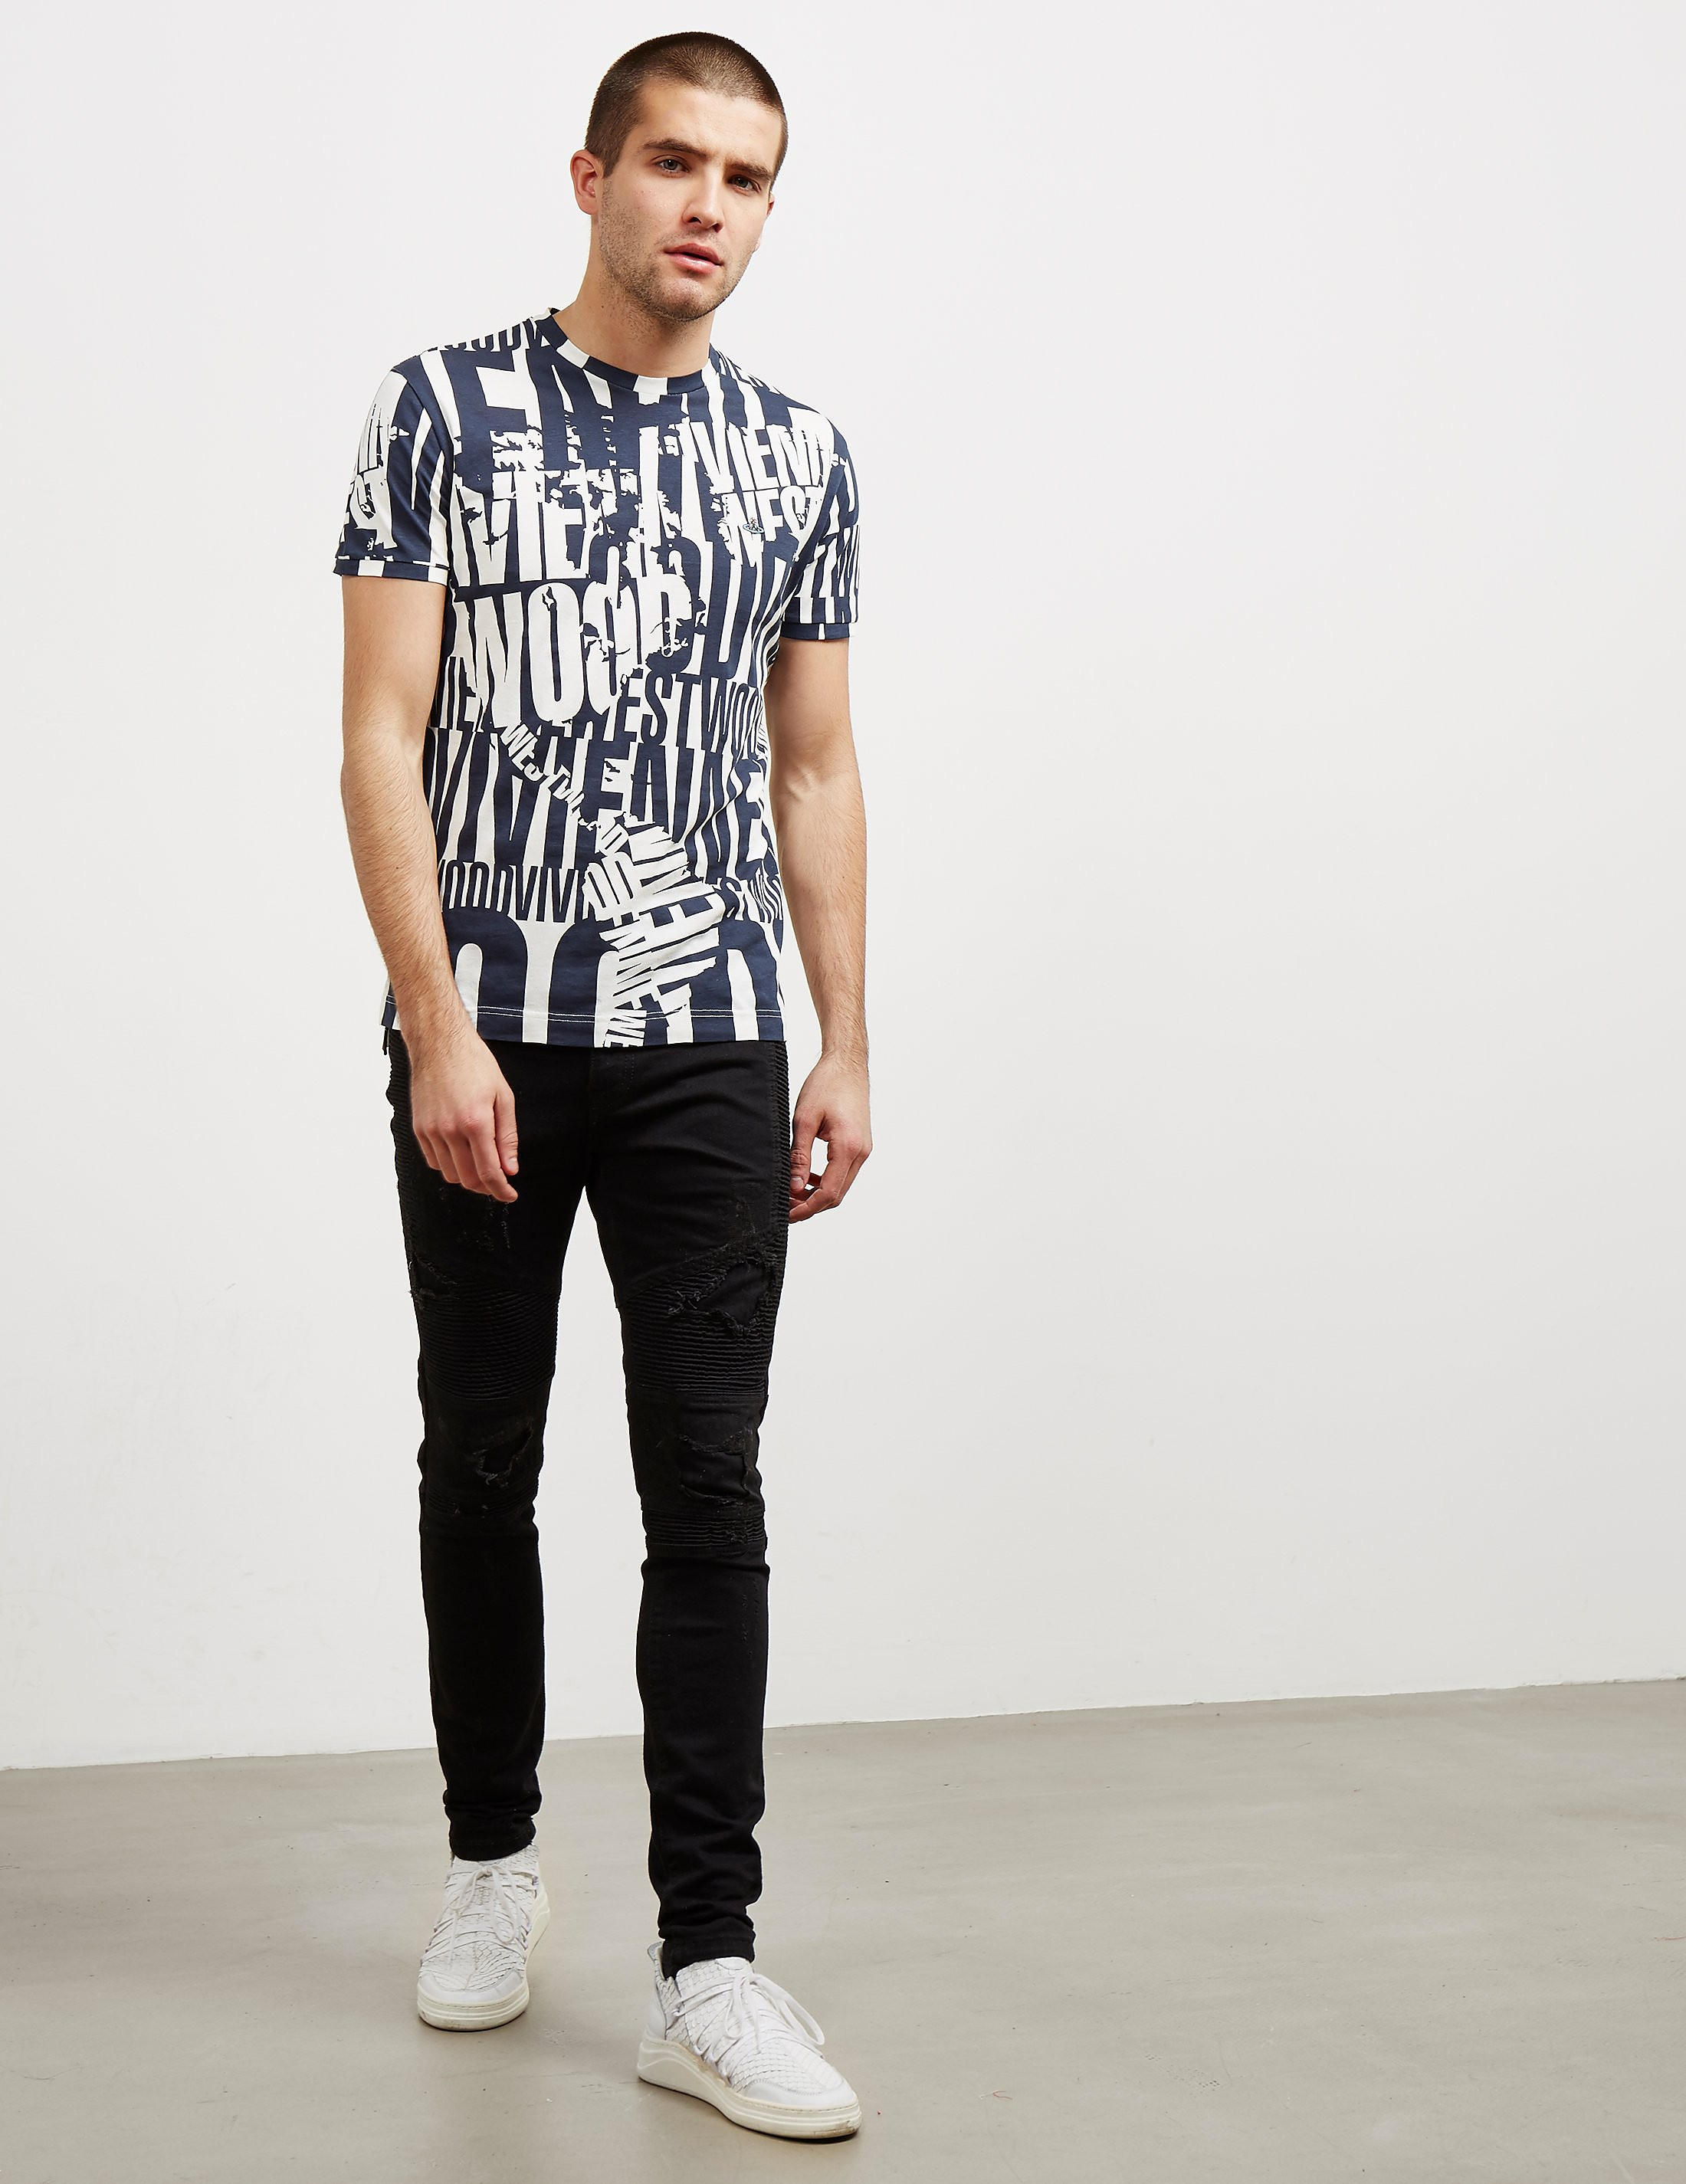 Vivienne Westwood Text Short Sleeve T-Shirt